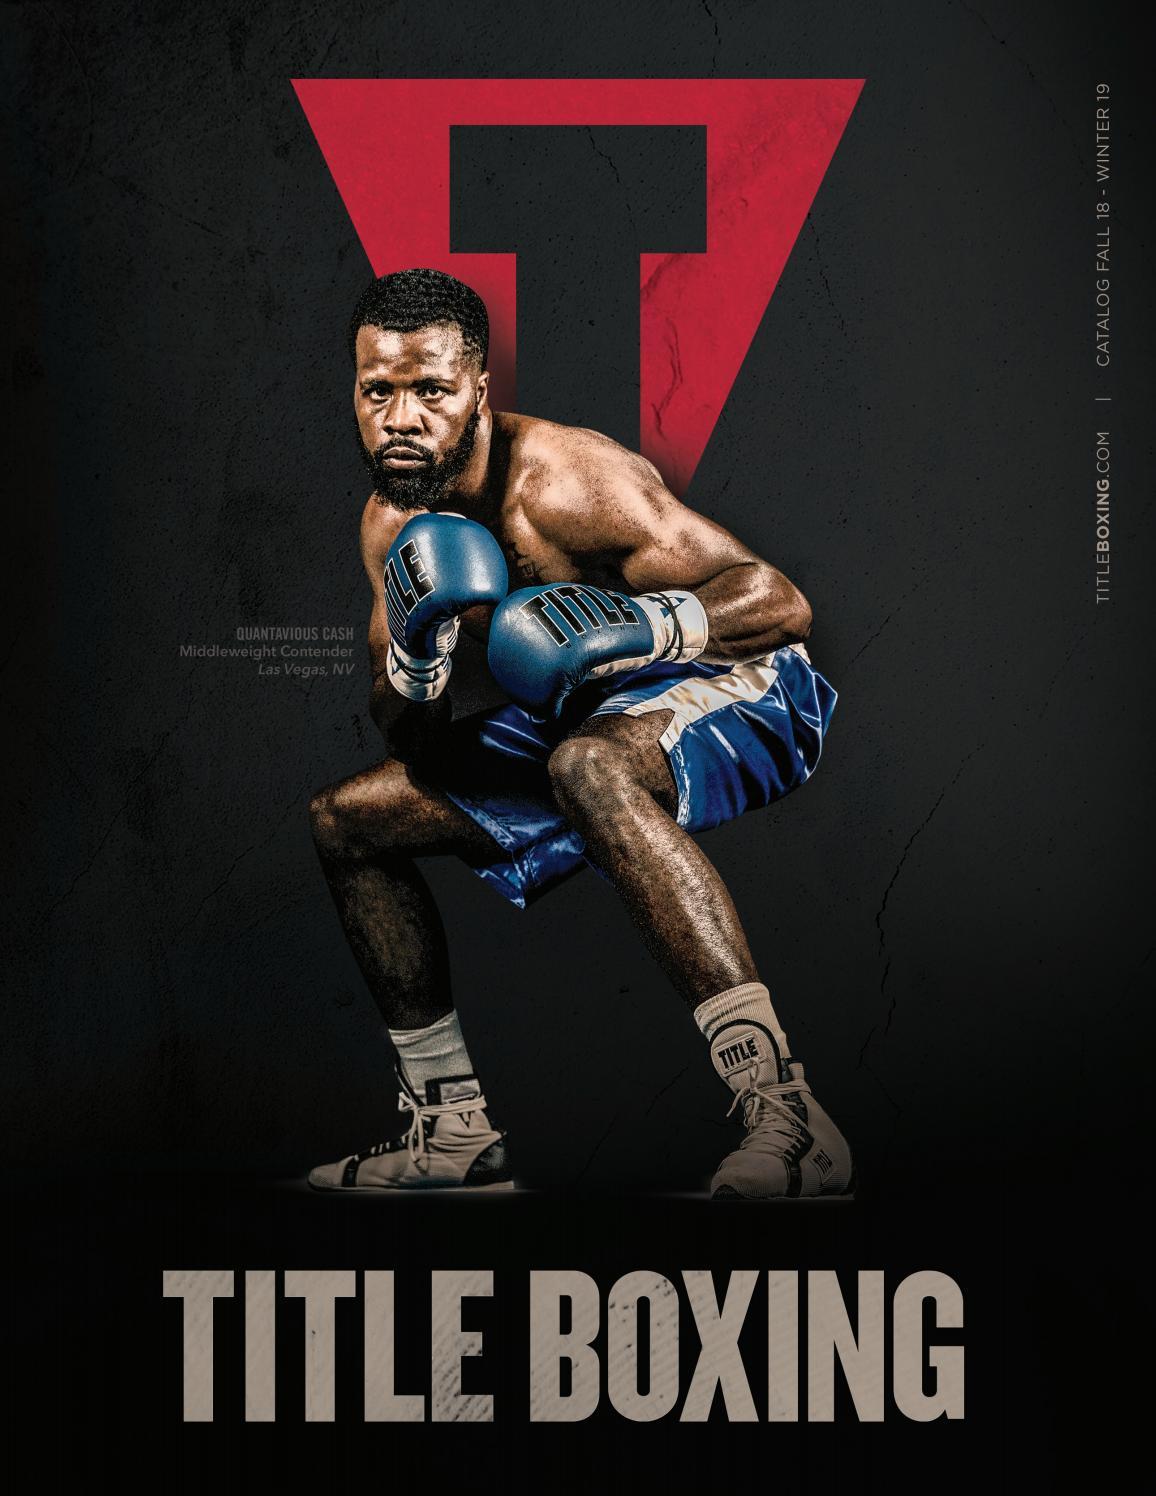 Bad Boy Force Jersey Black Blue Boxing Striking MMA Sparring Training Vest Gym